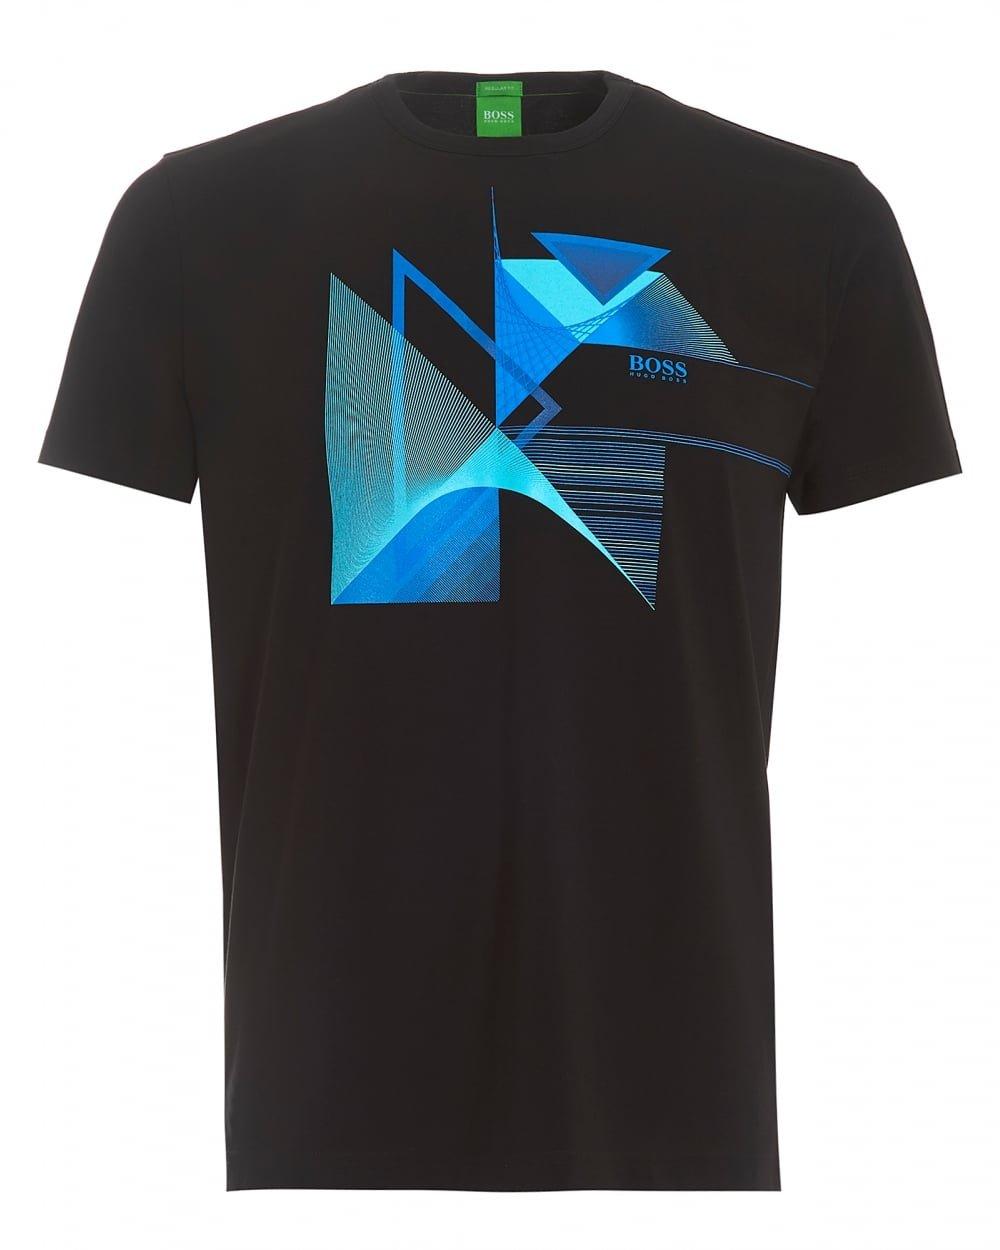 Hugo Boss Mens Short Sleeve Regular-Fit Printed T-Shirt In Single Jersey Tee 7 (L)